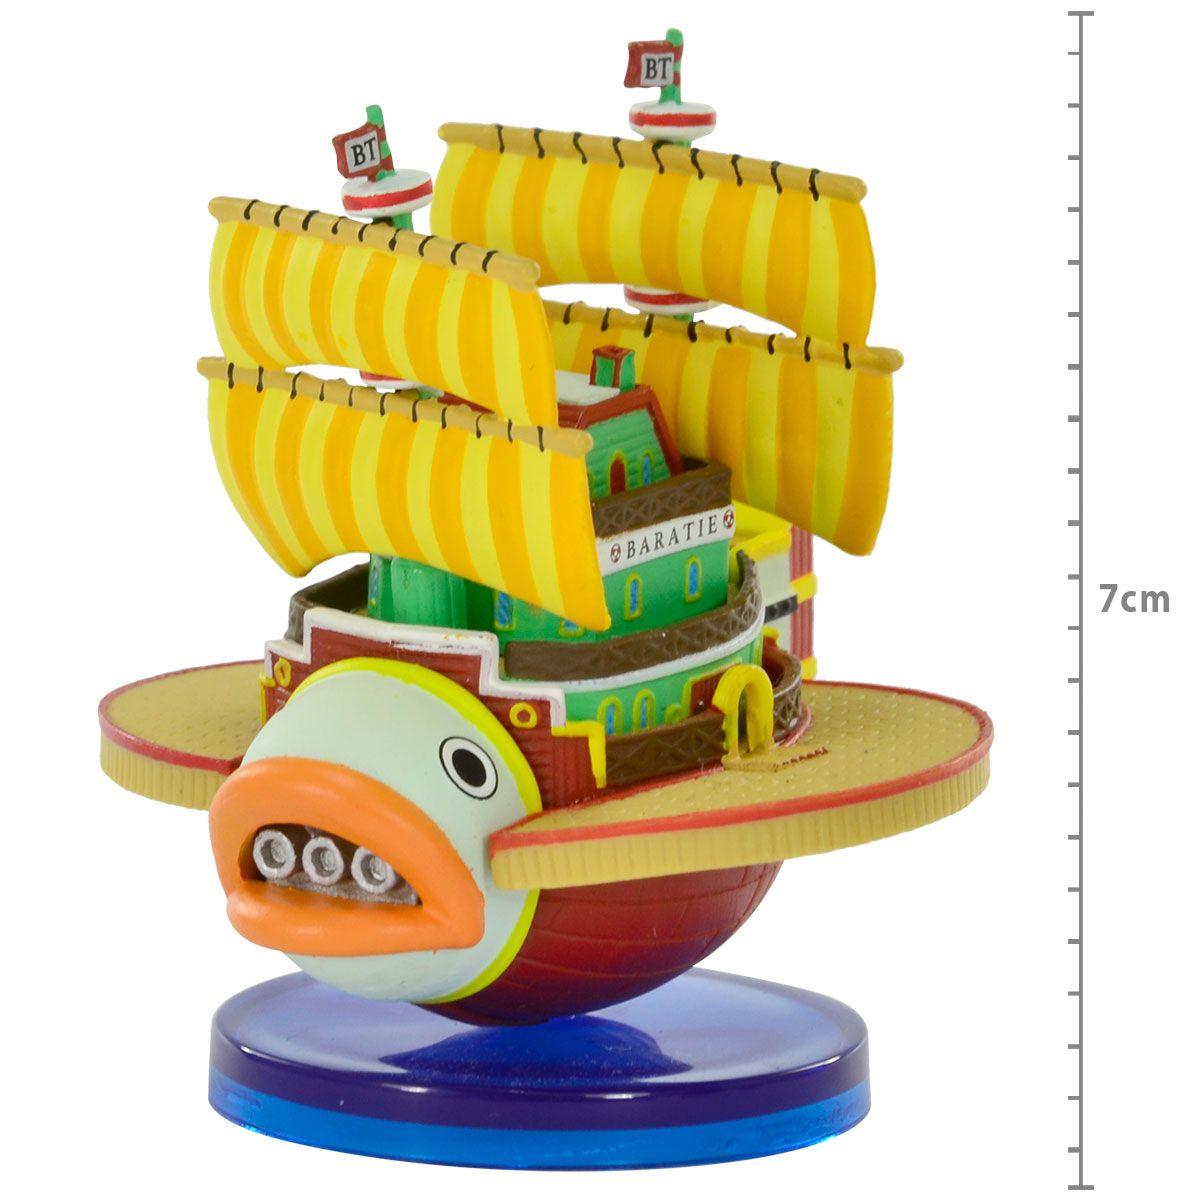 One Piece - Baratie - World Collectible Figure WCF - Sanji History - Banpresto